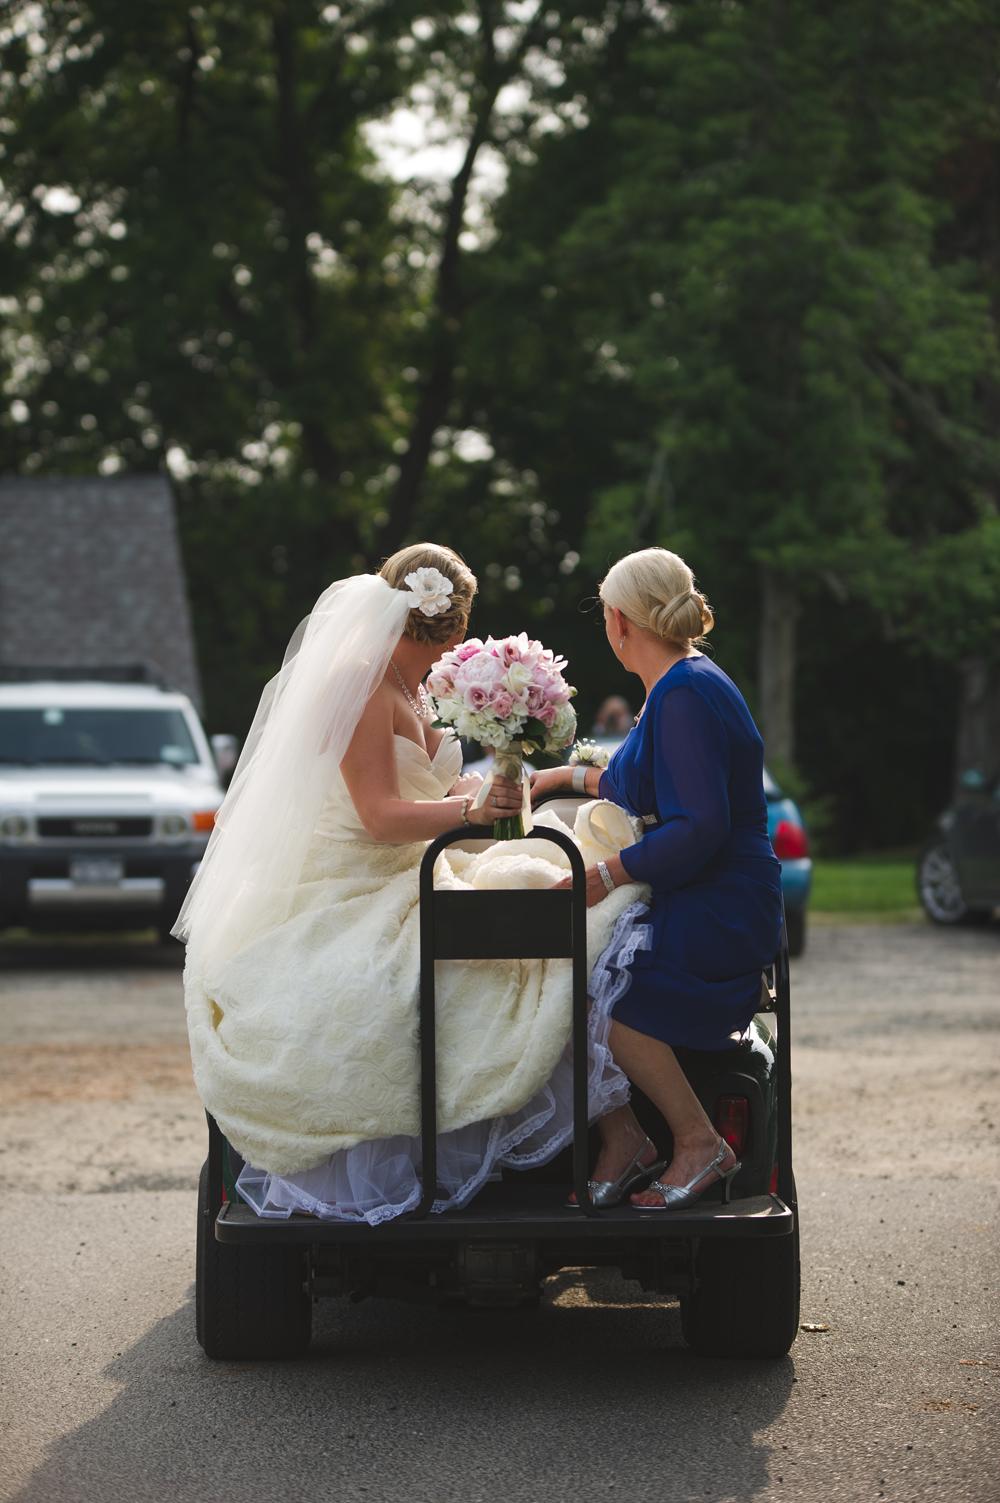 Tarrywile-Mansion-Wedding-Greg-Lewis-Photo-38